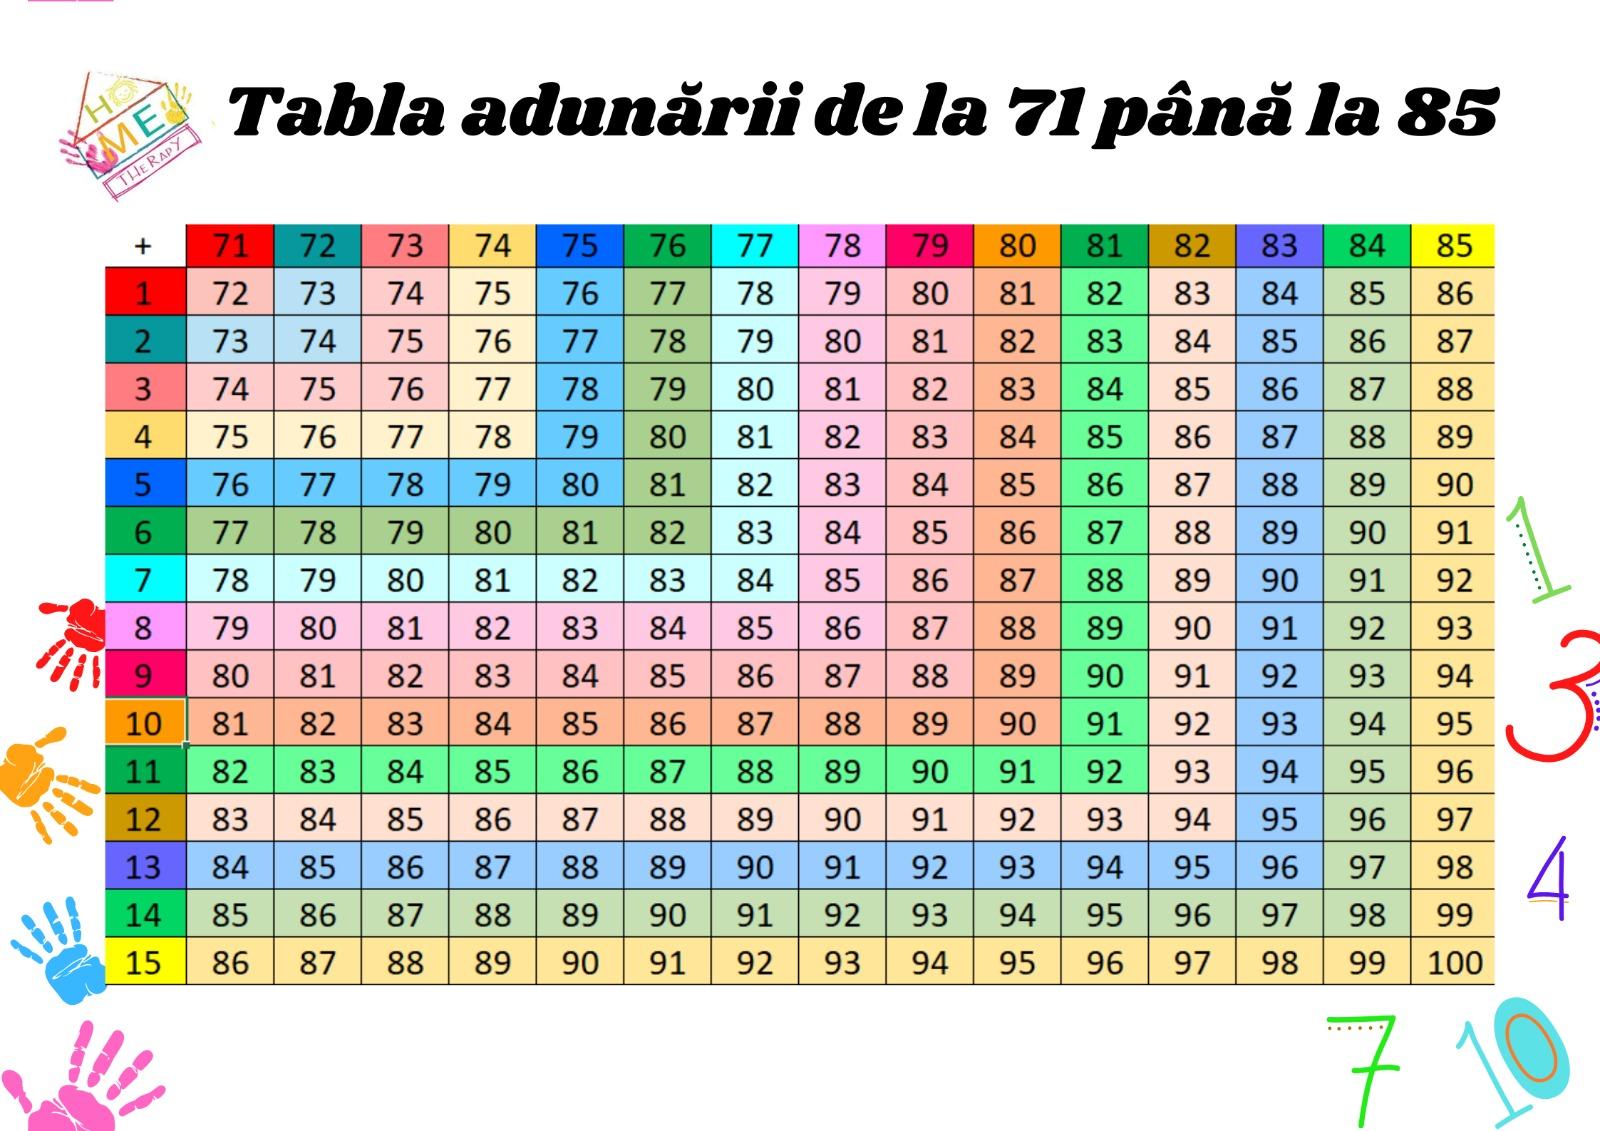 Tabla adunarii de la 71 pana la 85